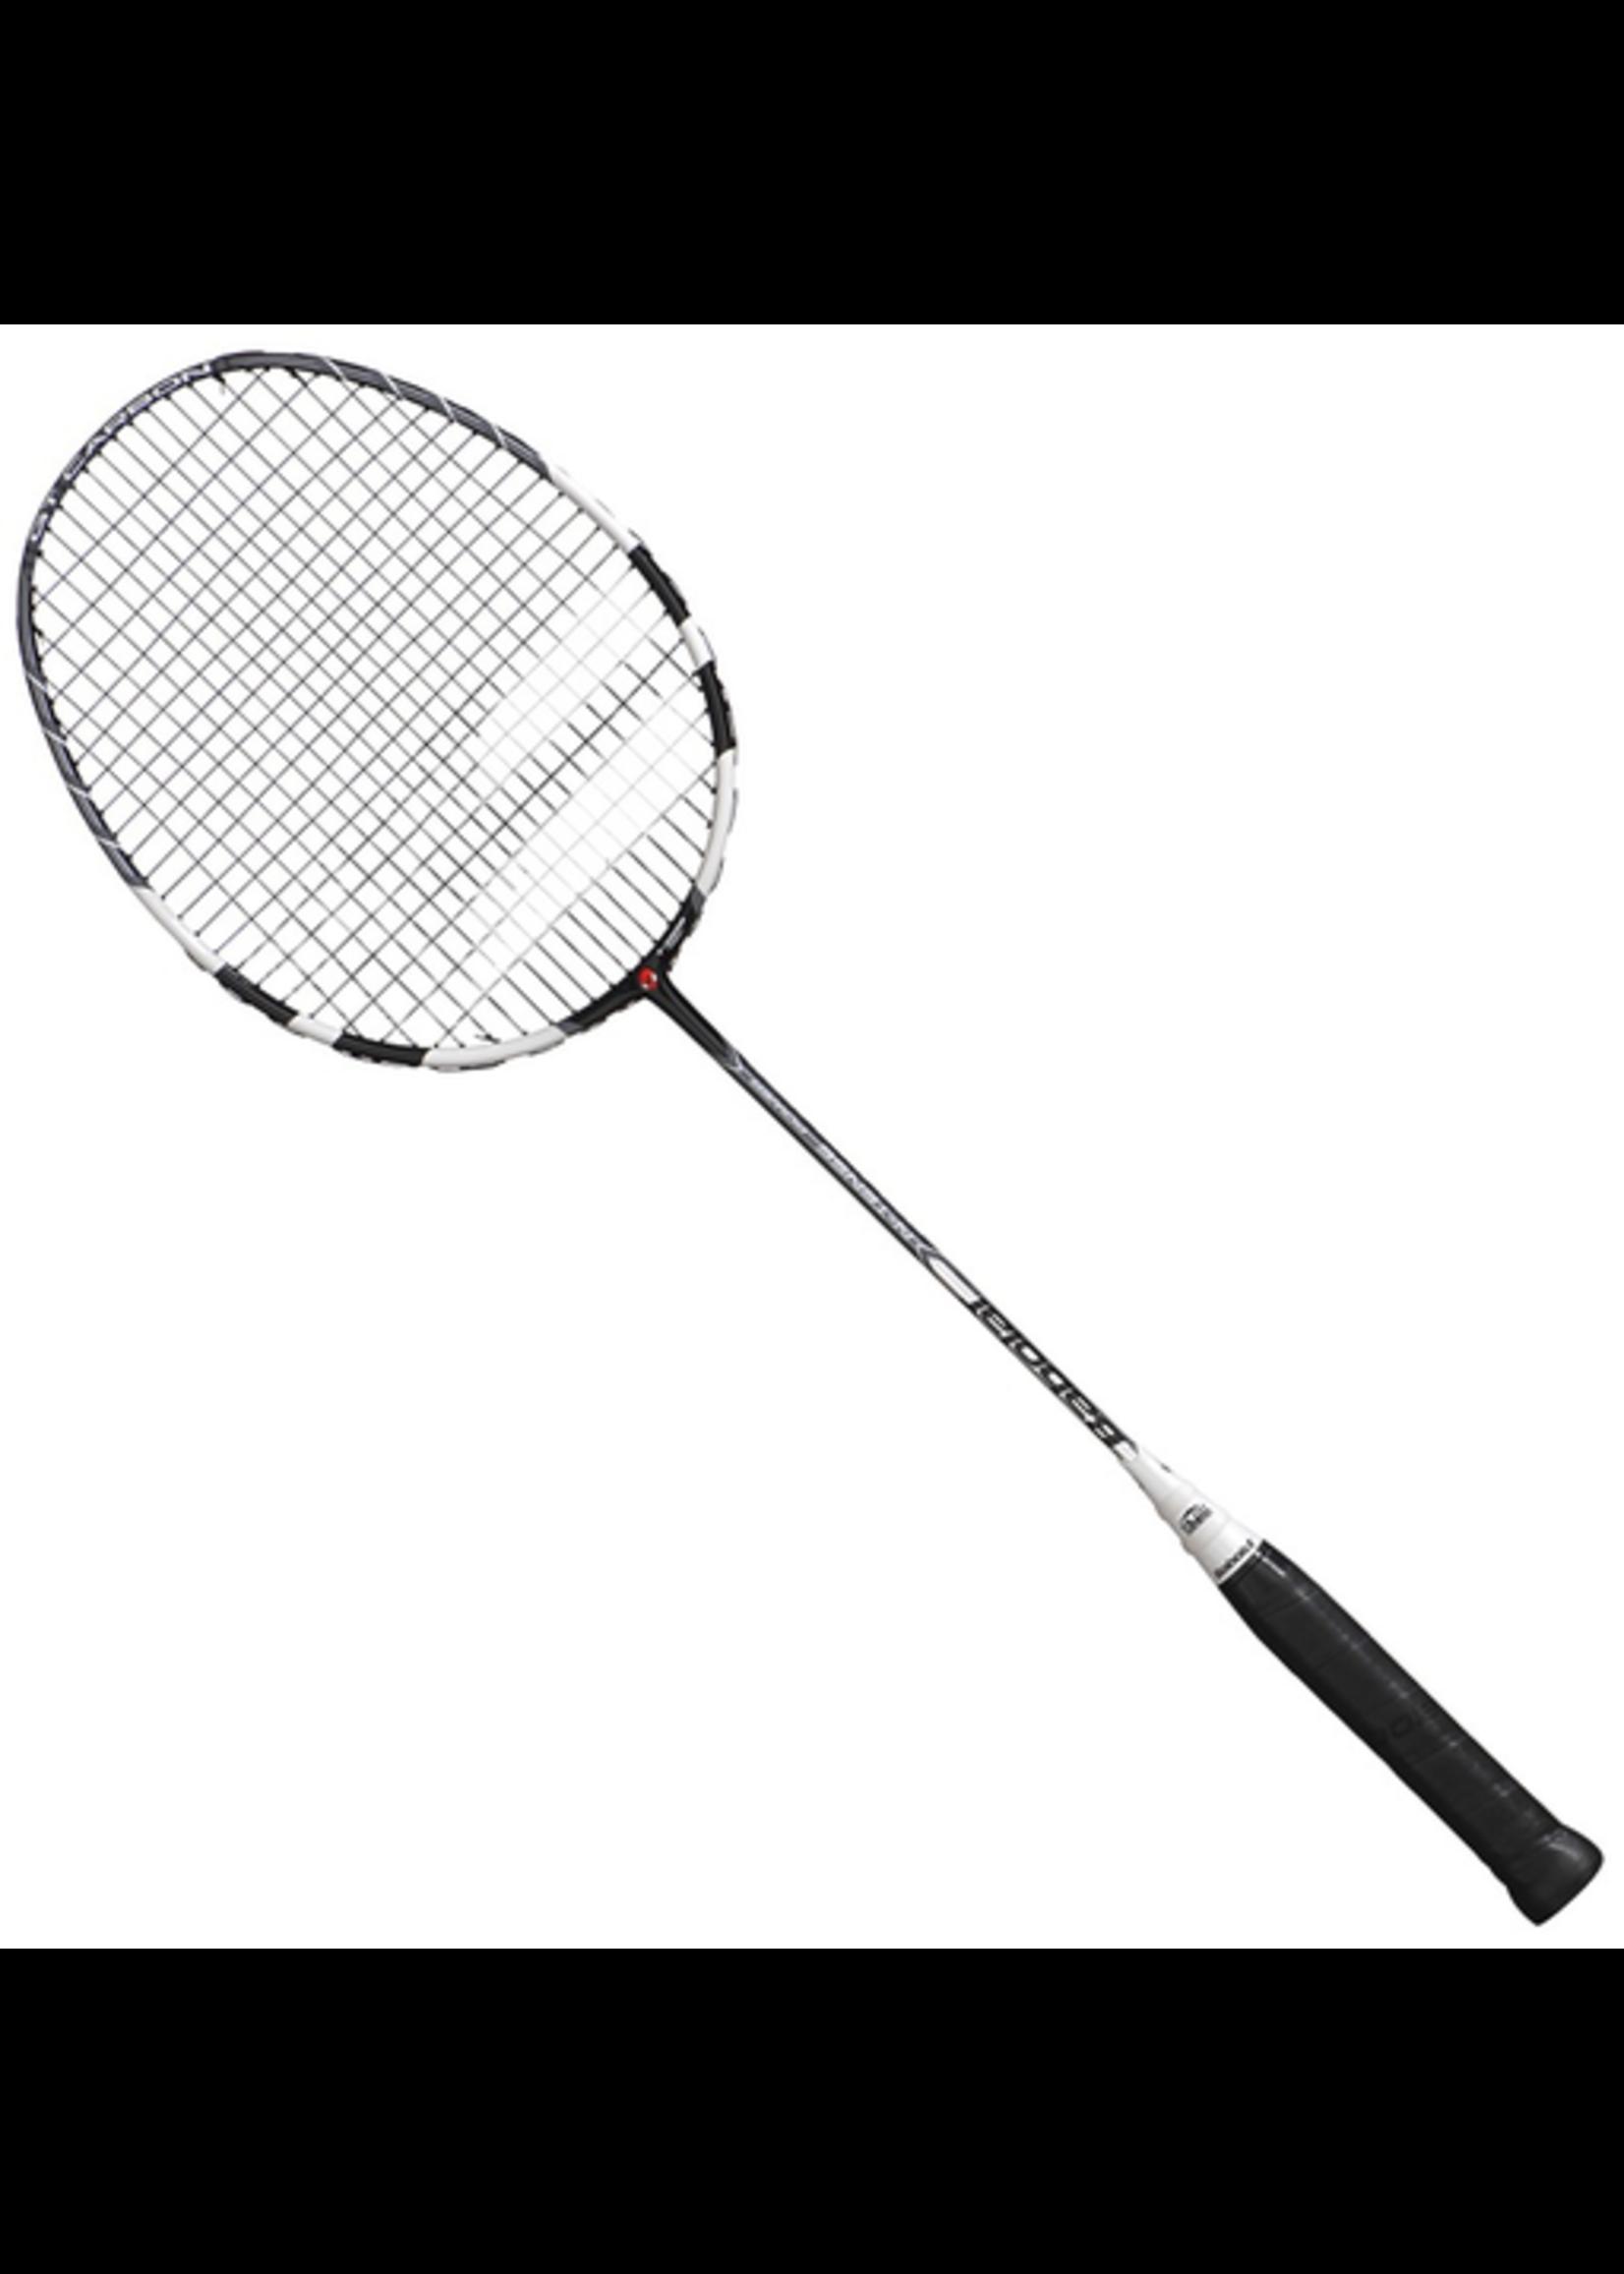 Babolat Babolat N-Tense Power Badminton Racket Black one size